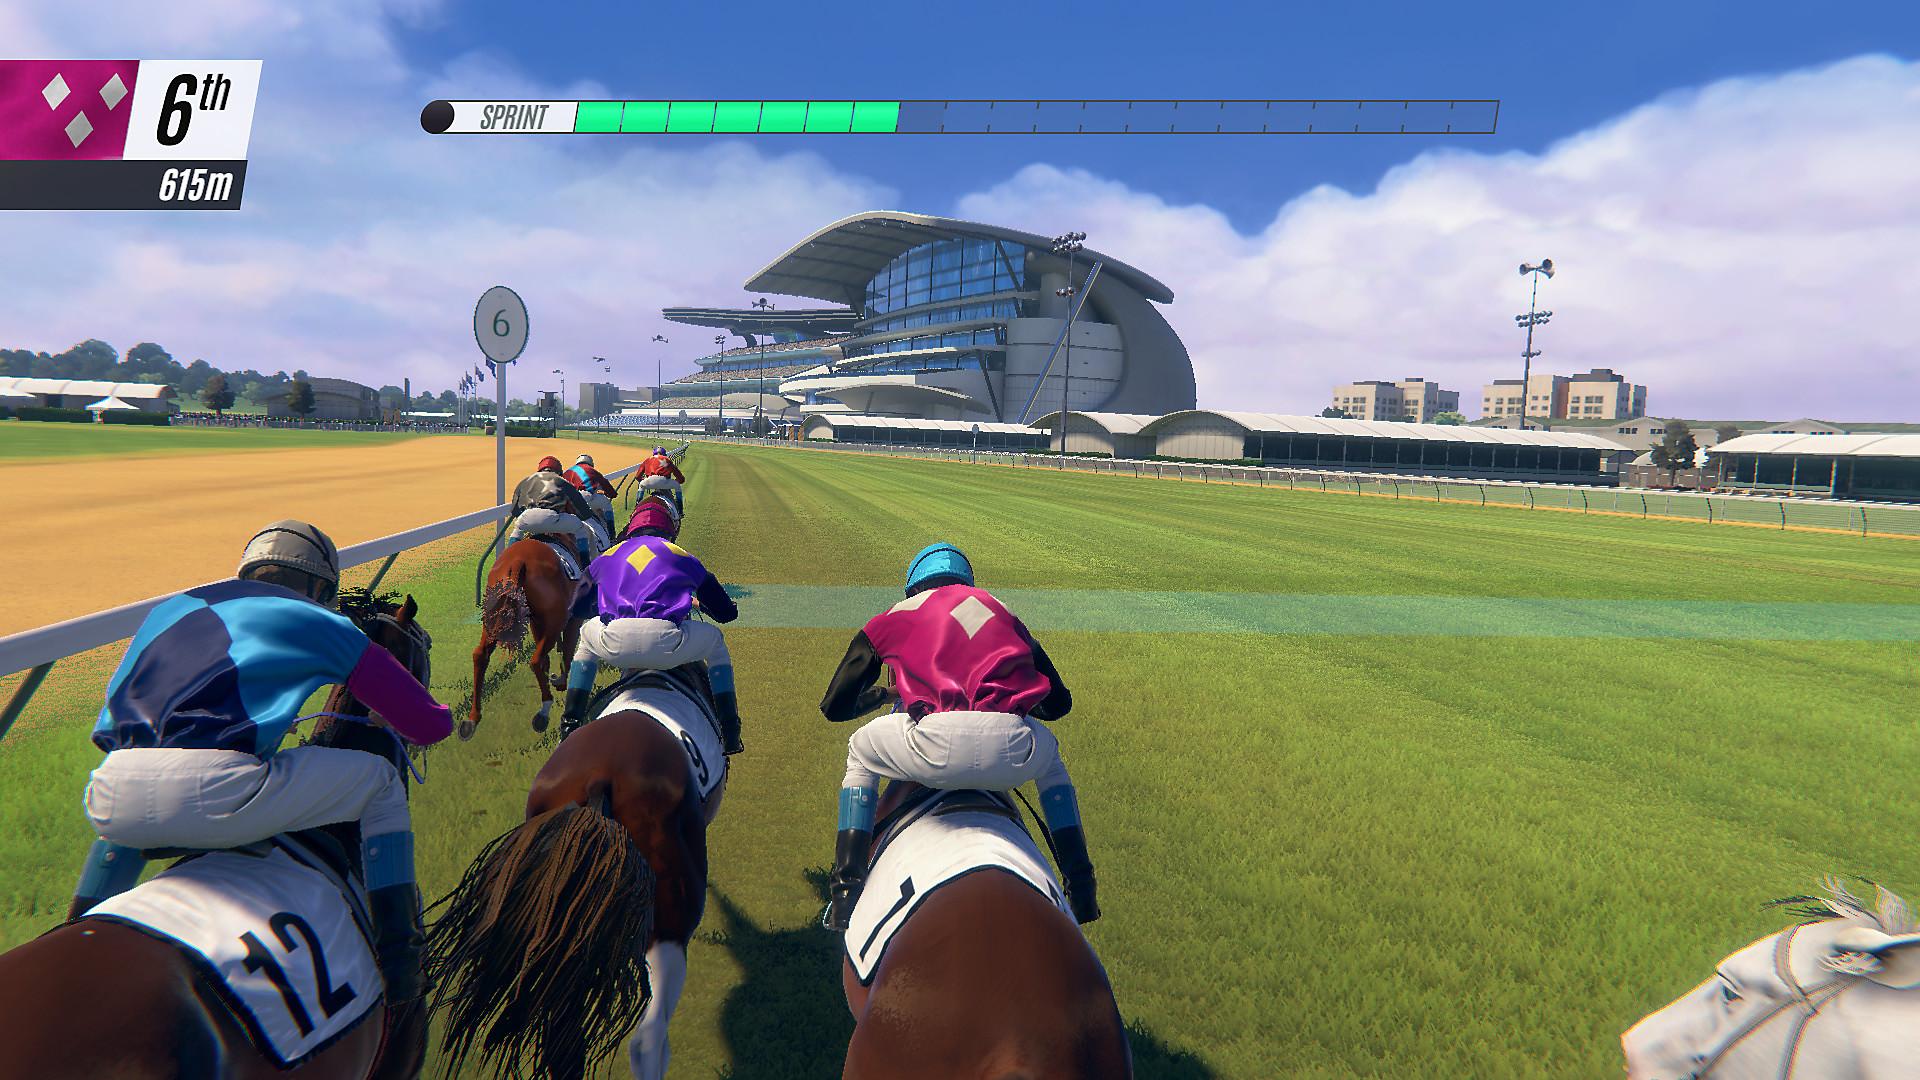 phar-lap-horse-racing-challenge-screenshot-04-ps4-us-26mar2019.jpg